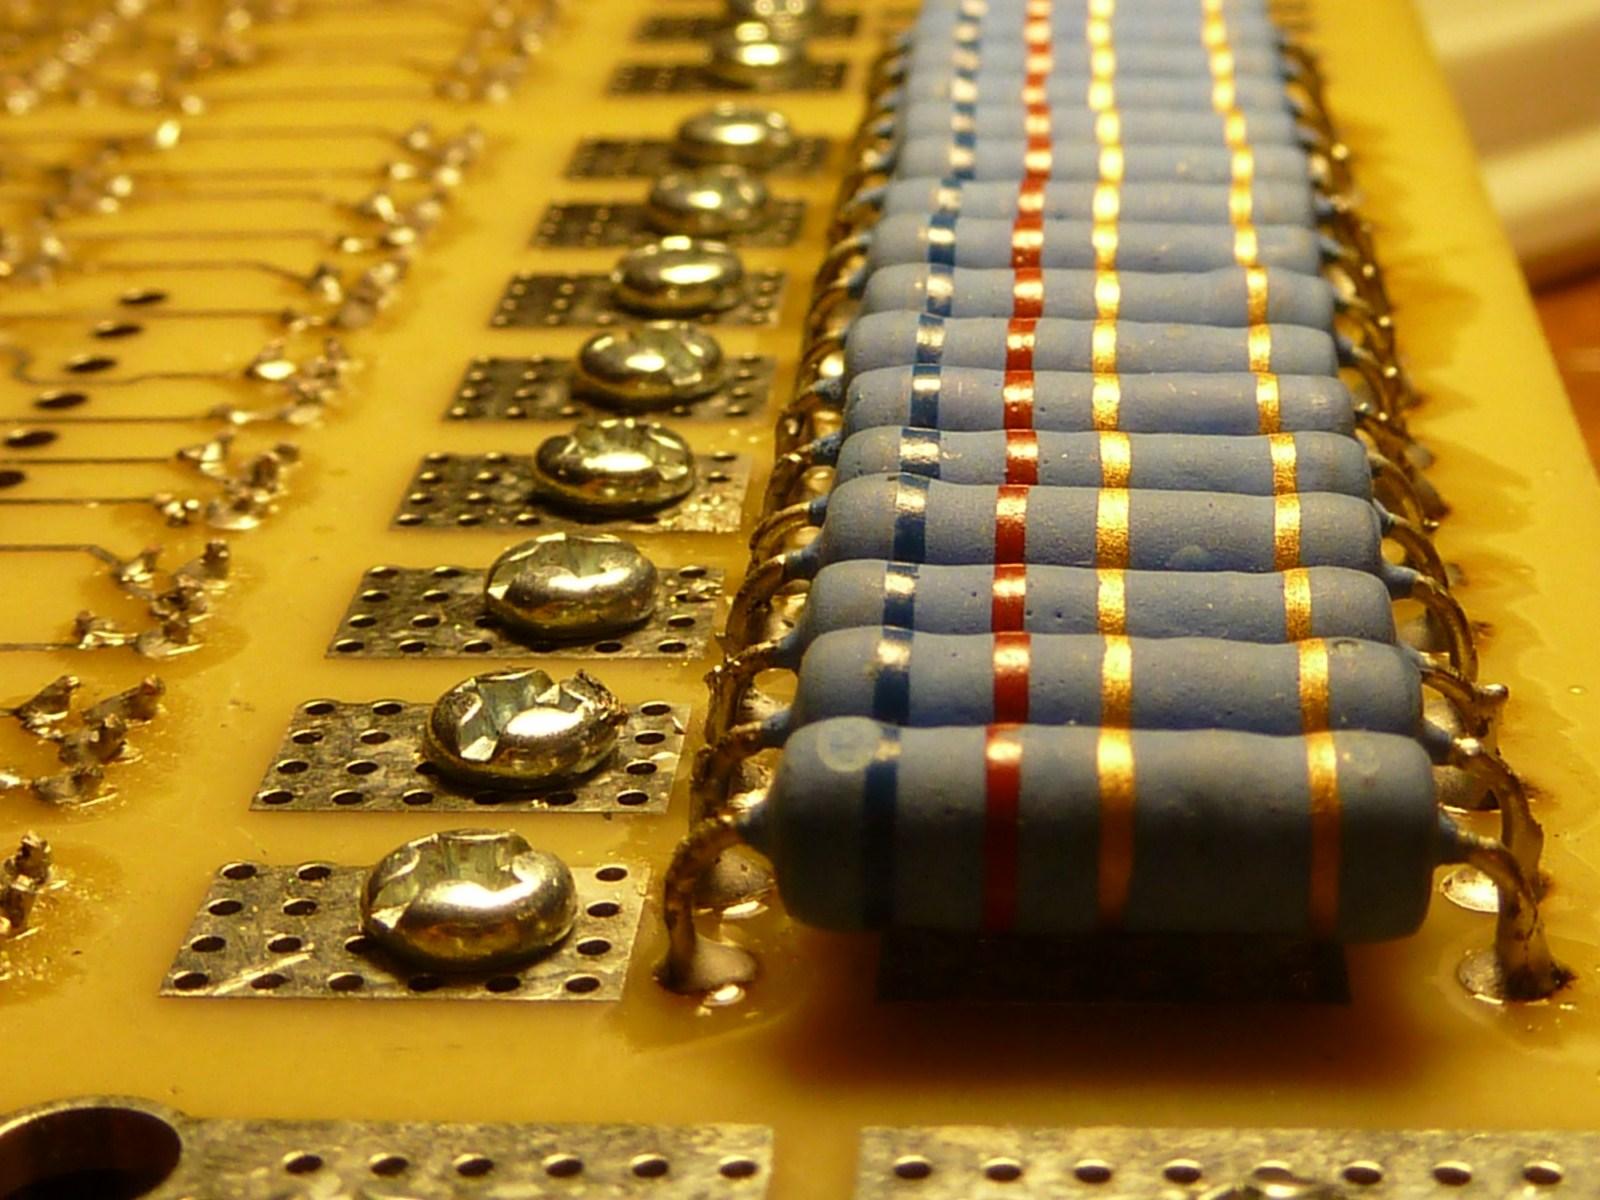 Best 47 Resistor Wallpaper on HipWallpaper Resistor Wallpaper 1600x1200